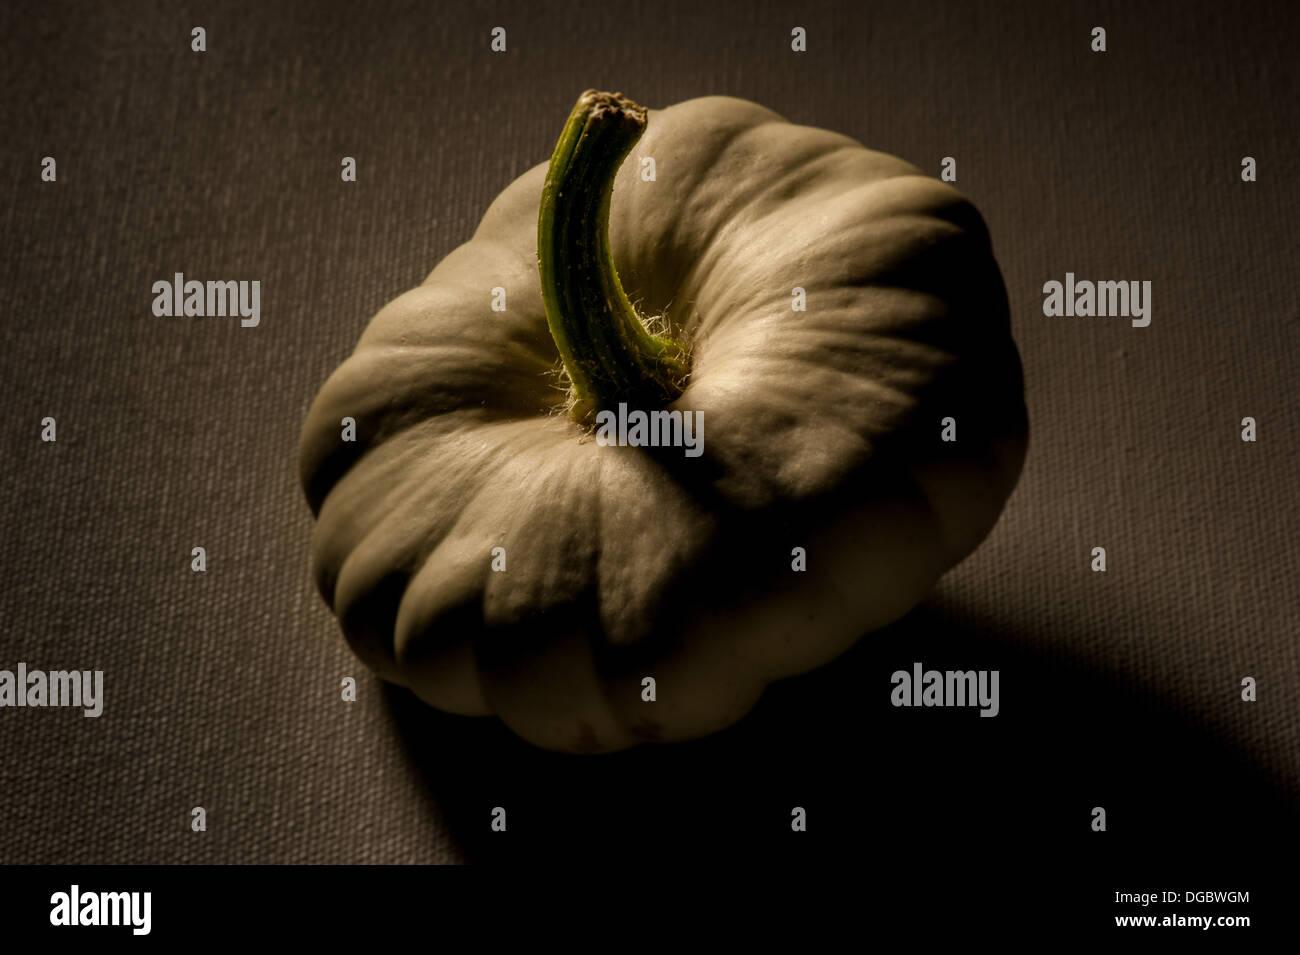 Pattypan squash - Stock Image